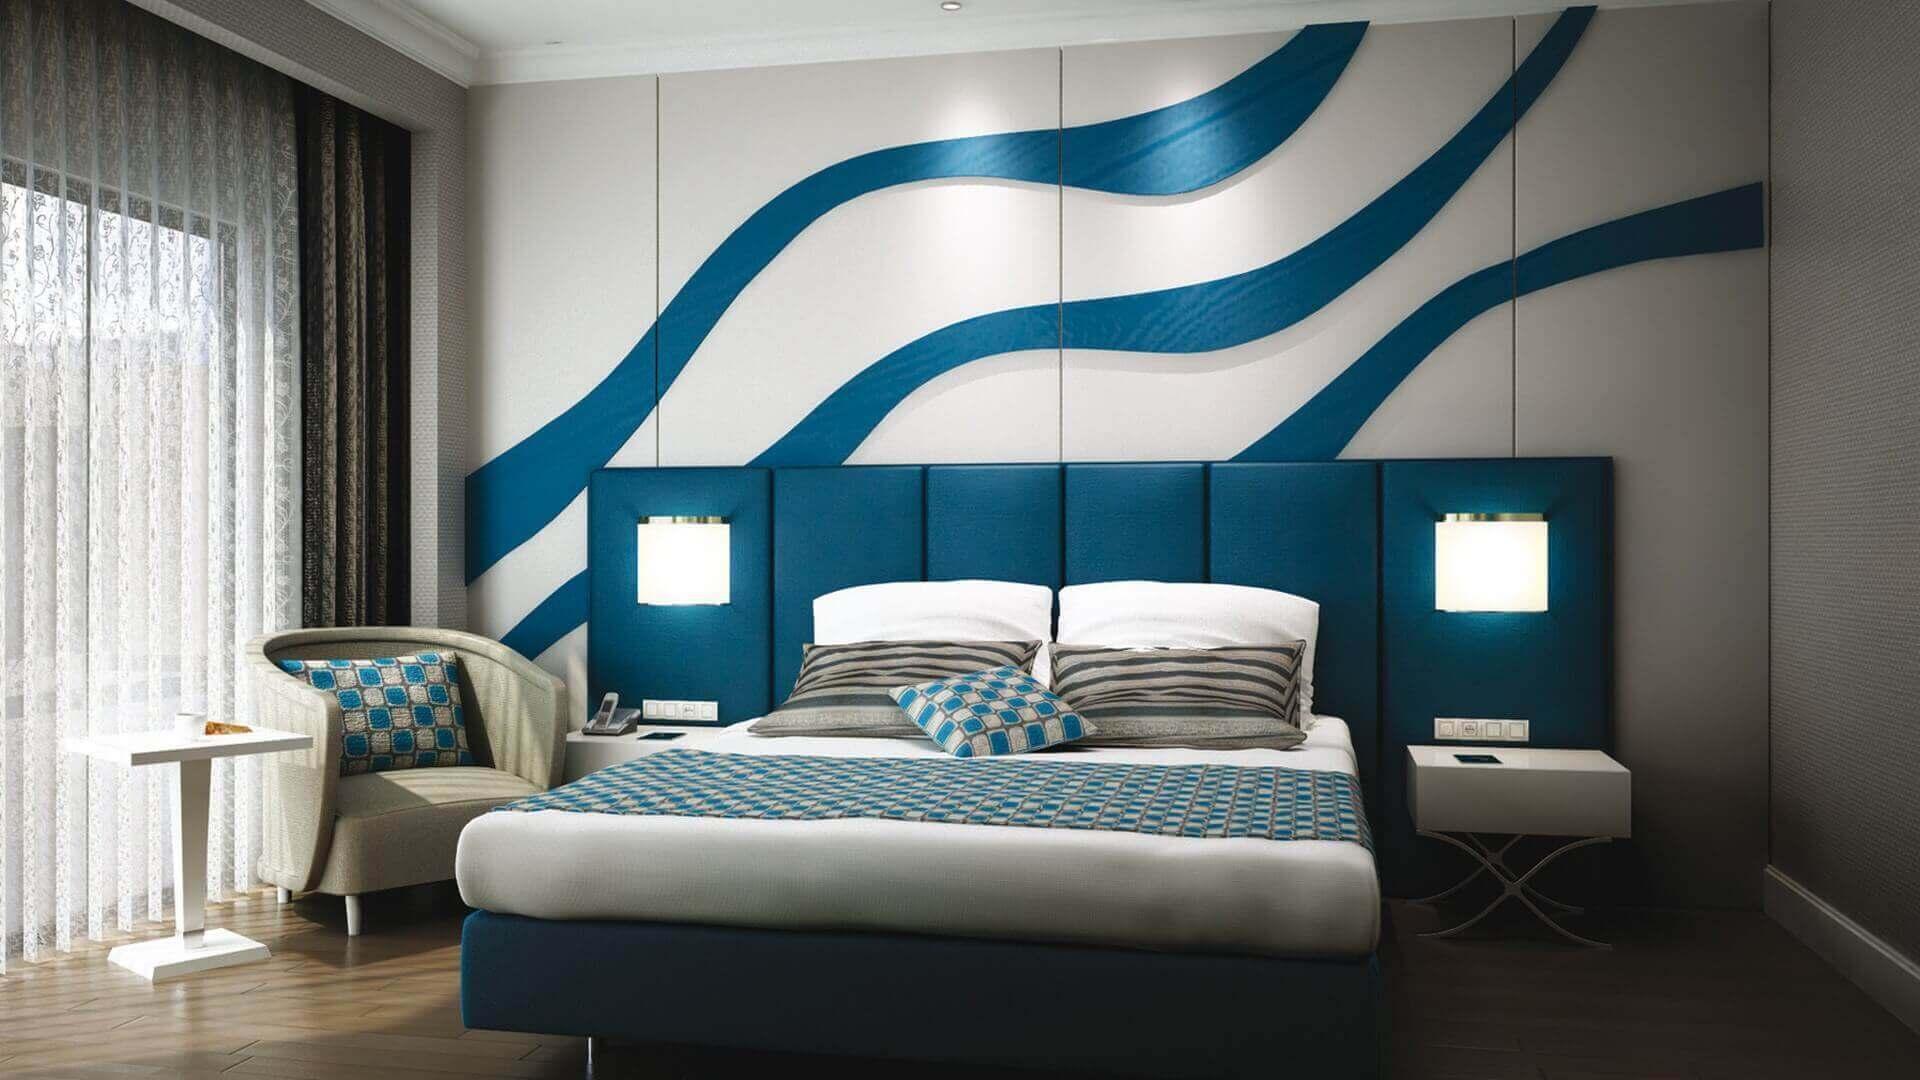 Lobby design 2142 Arbil Sheraton, IRAQ Hotels